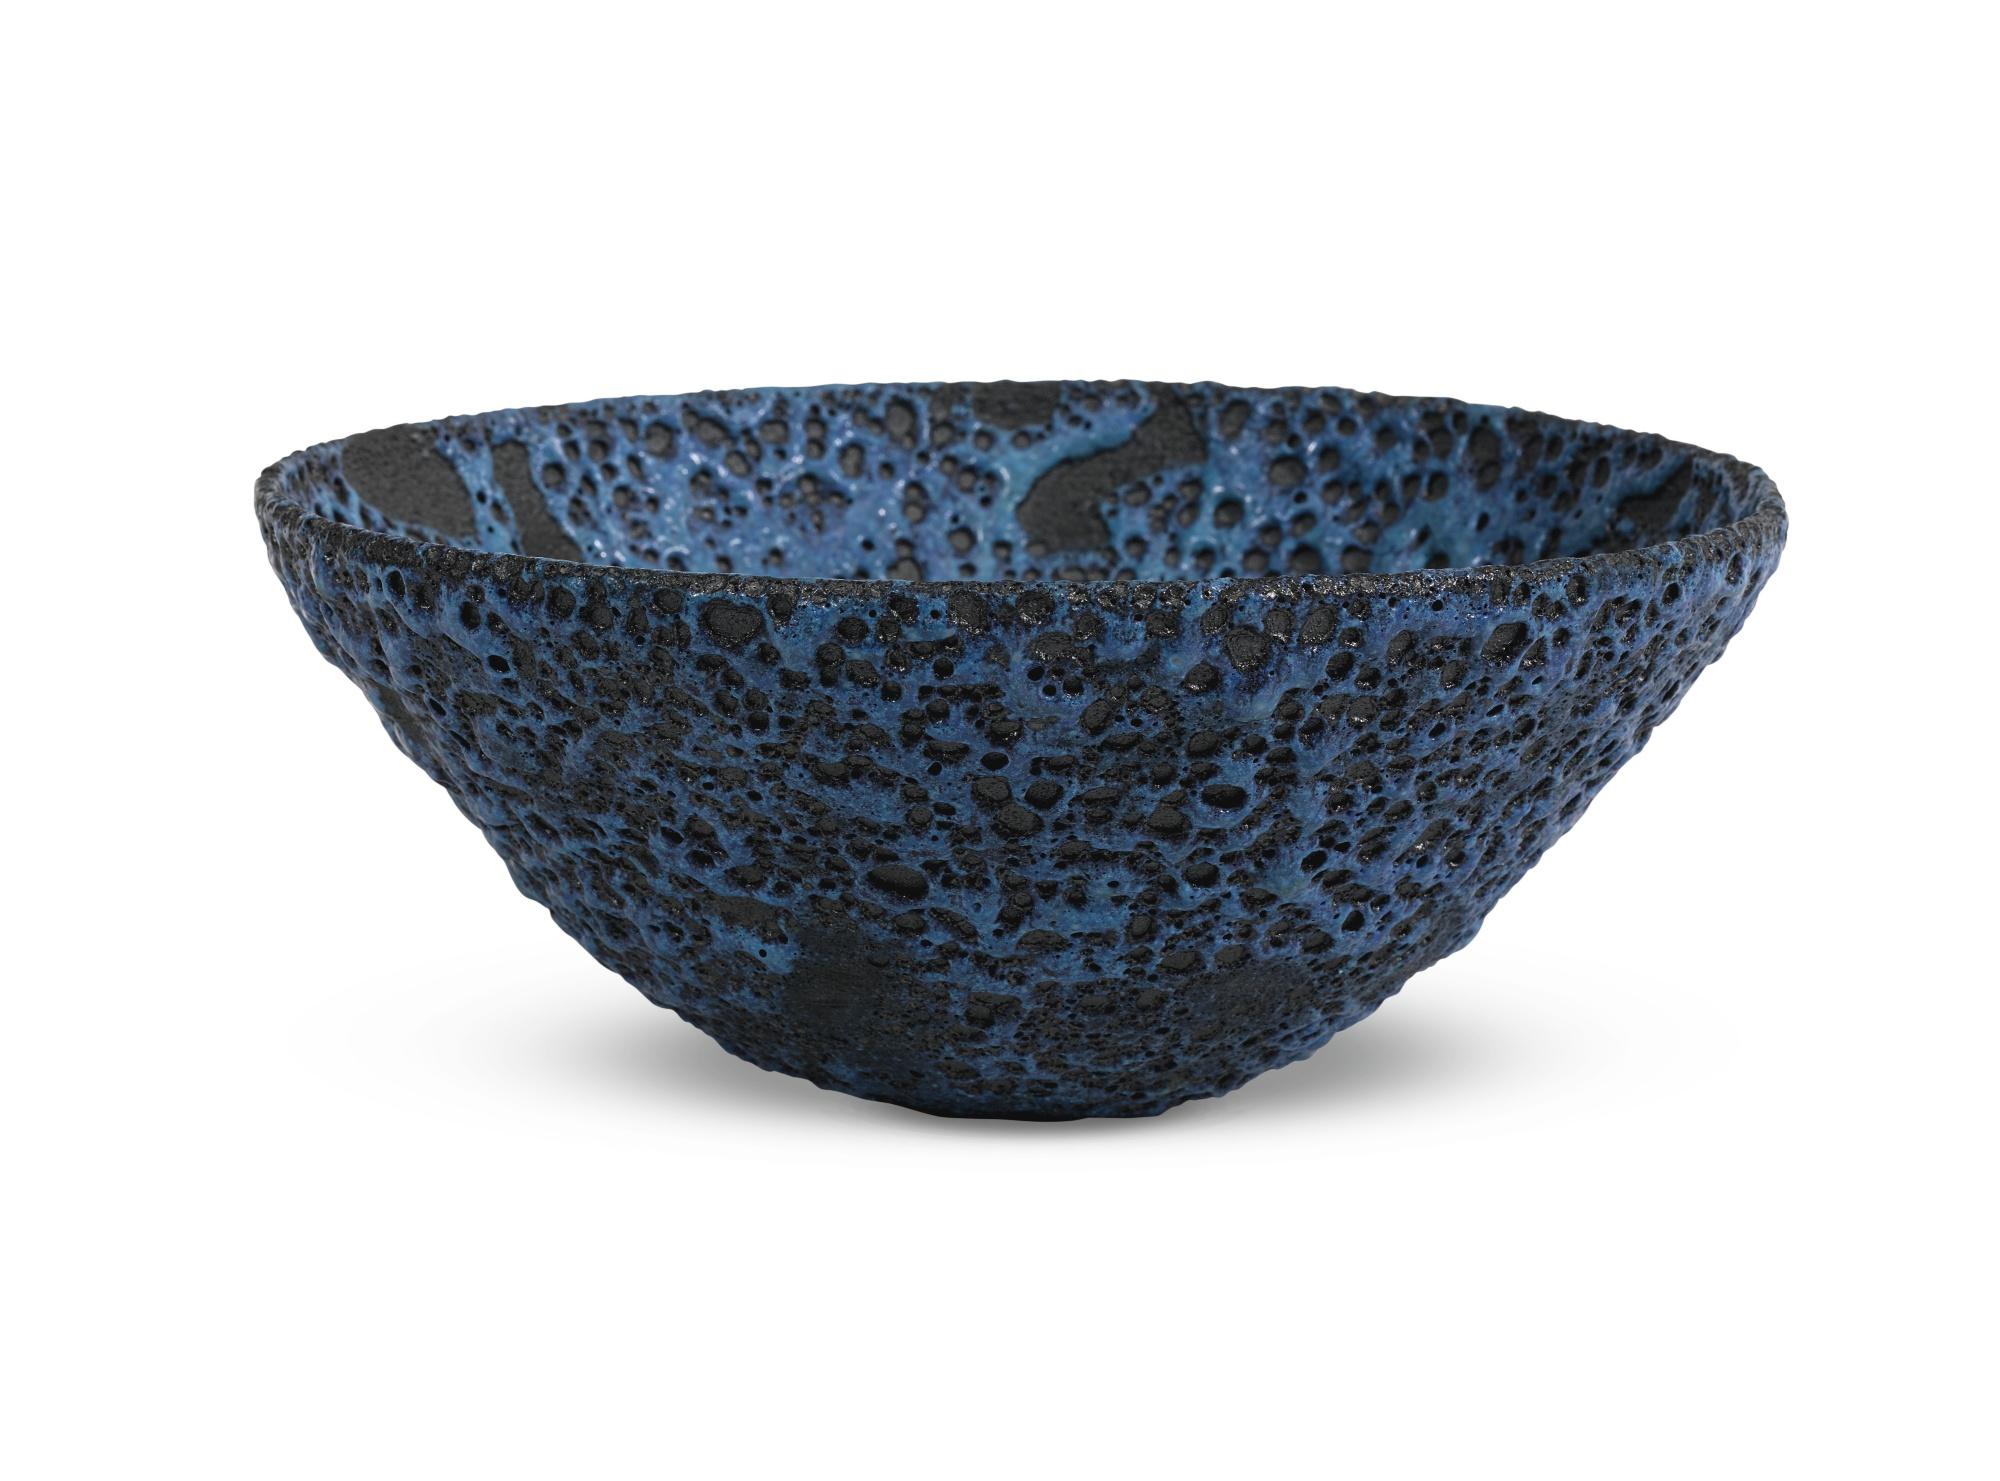 Emmanuel Cooper-Blue Bowl-1999